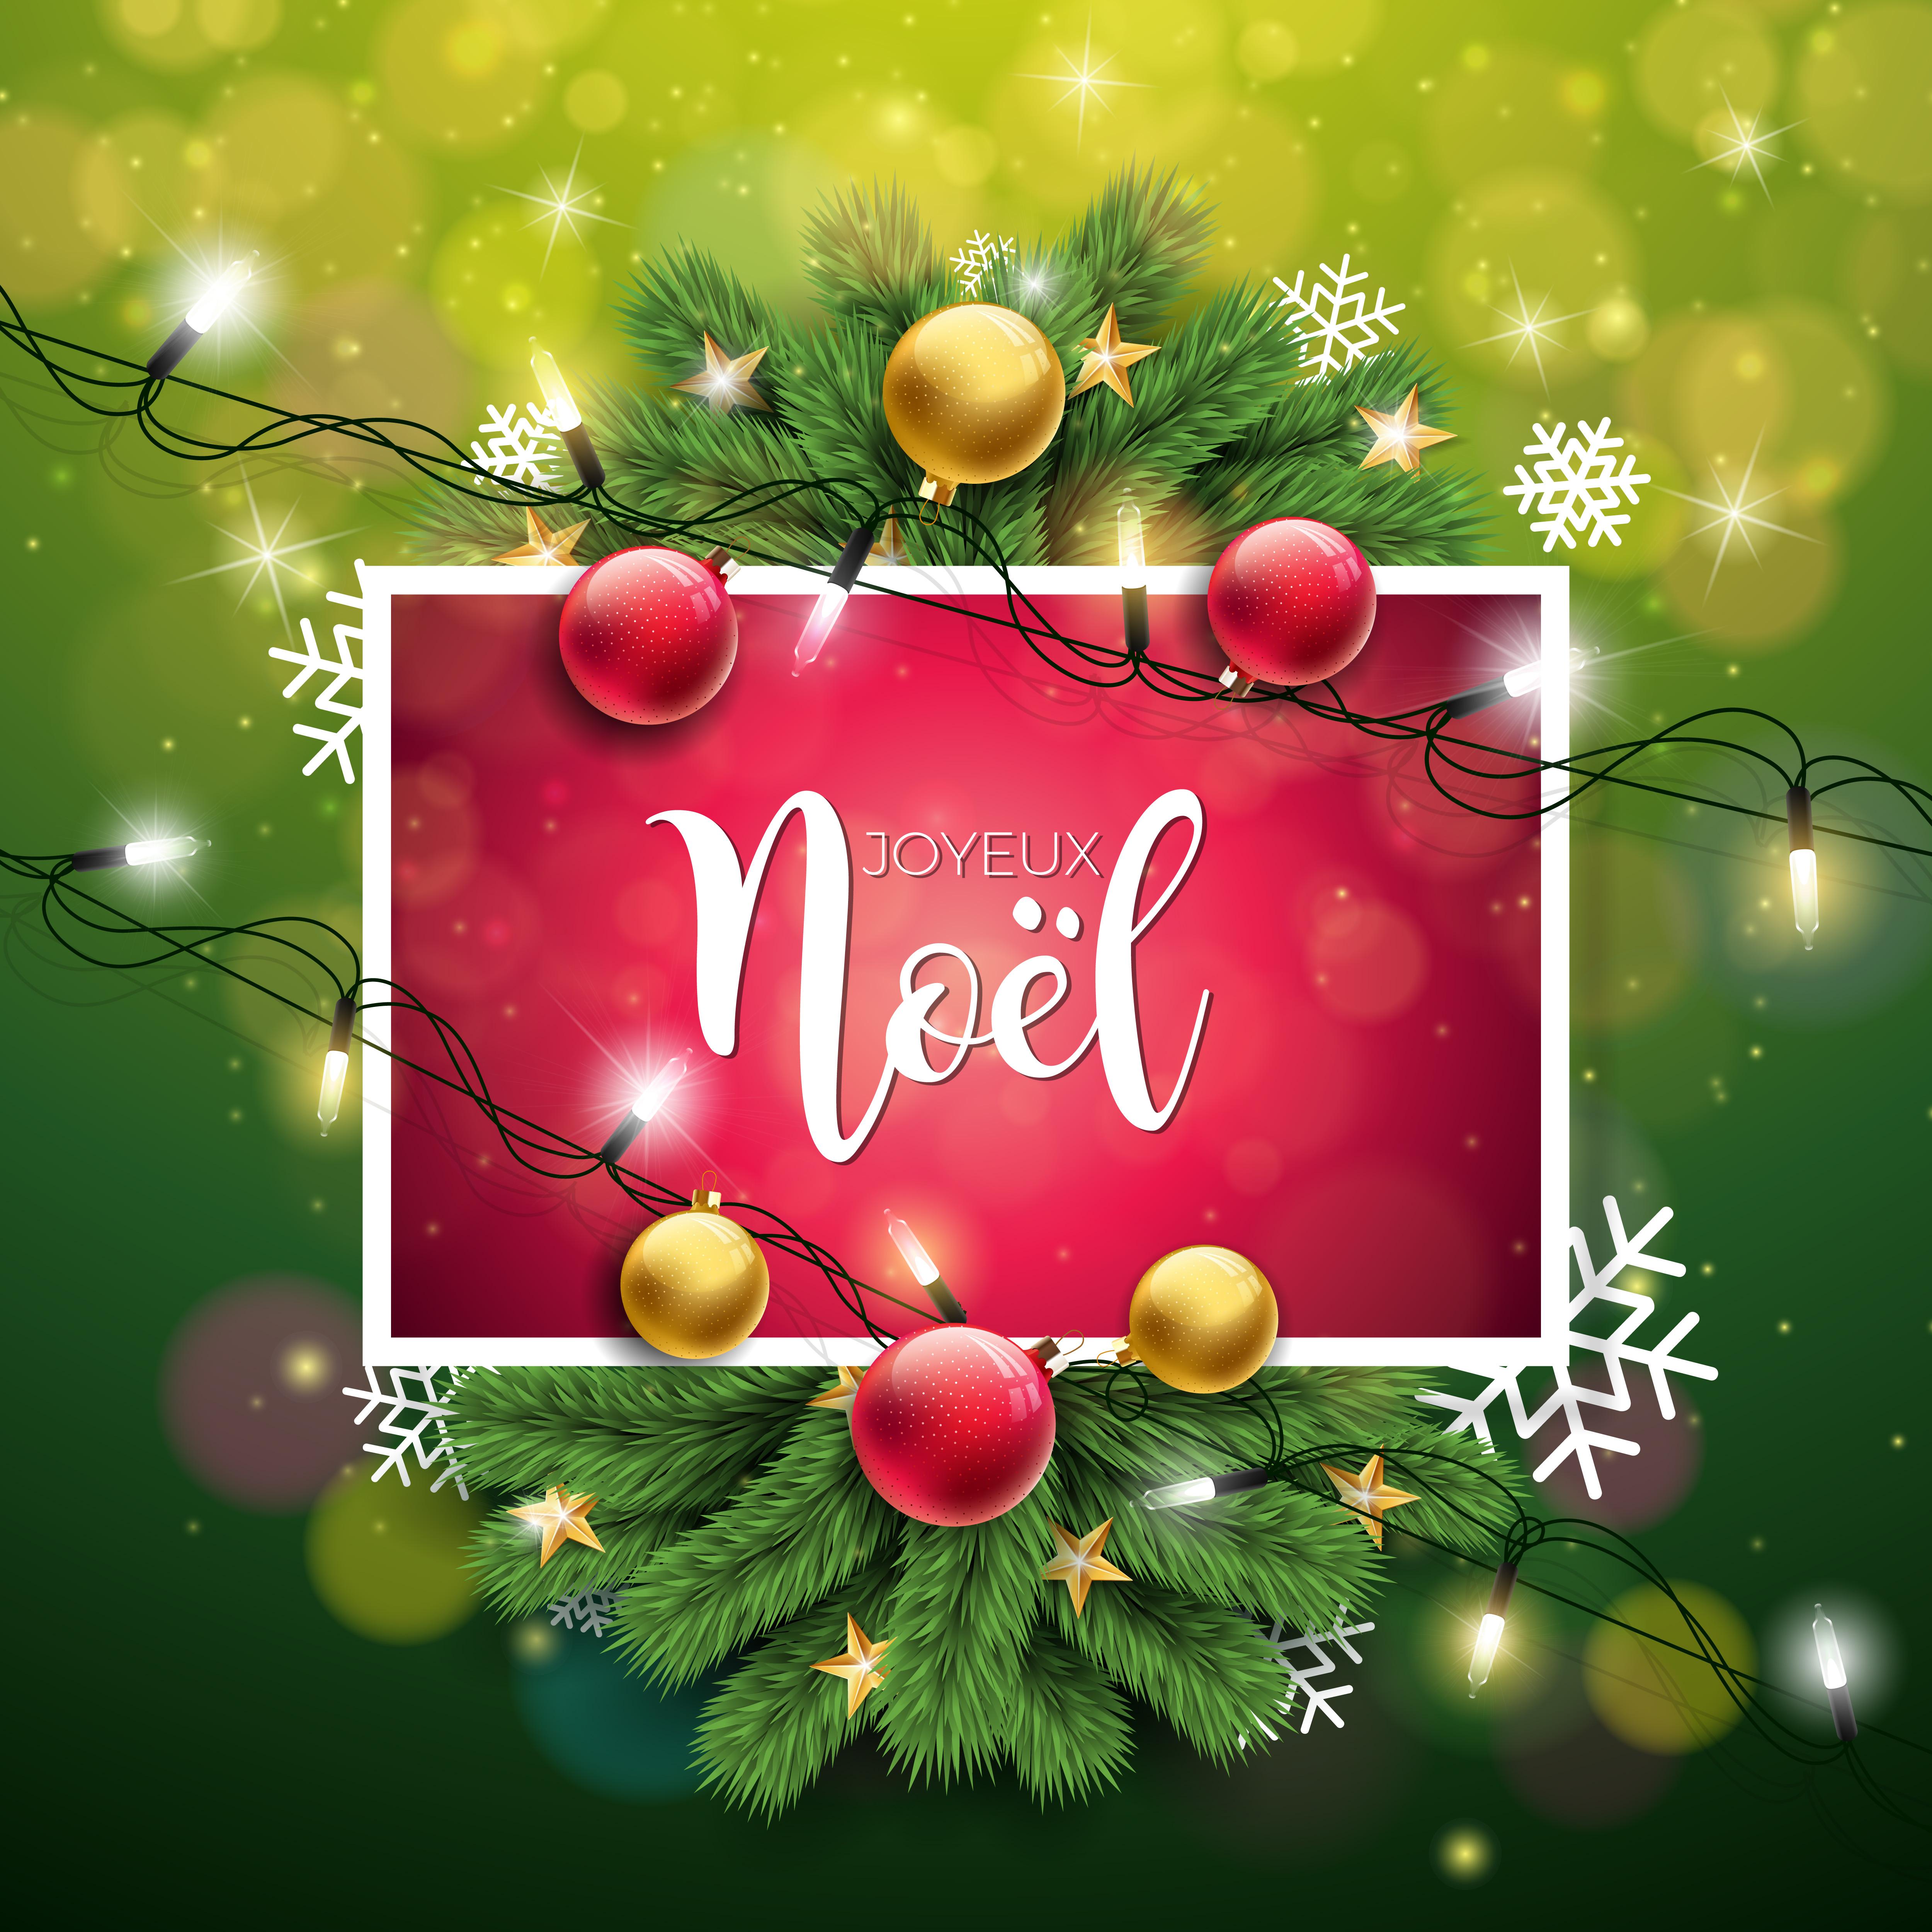 Vector Christmas Illustration With French Joyeux Noel